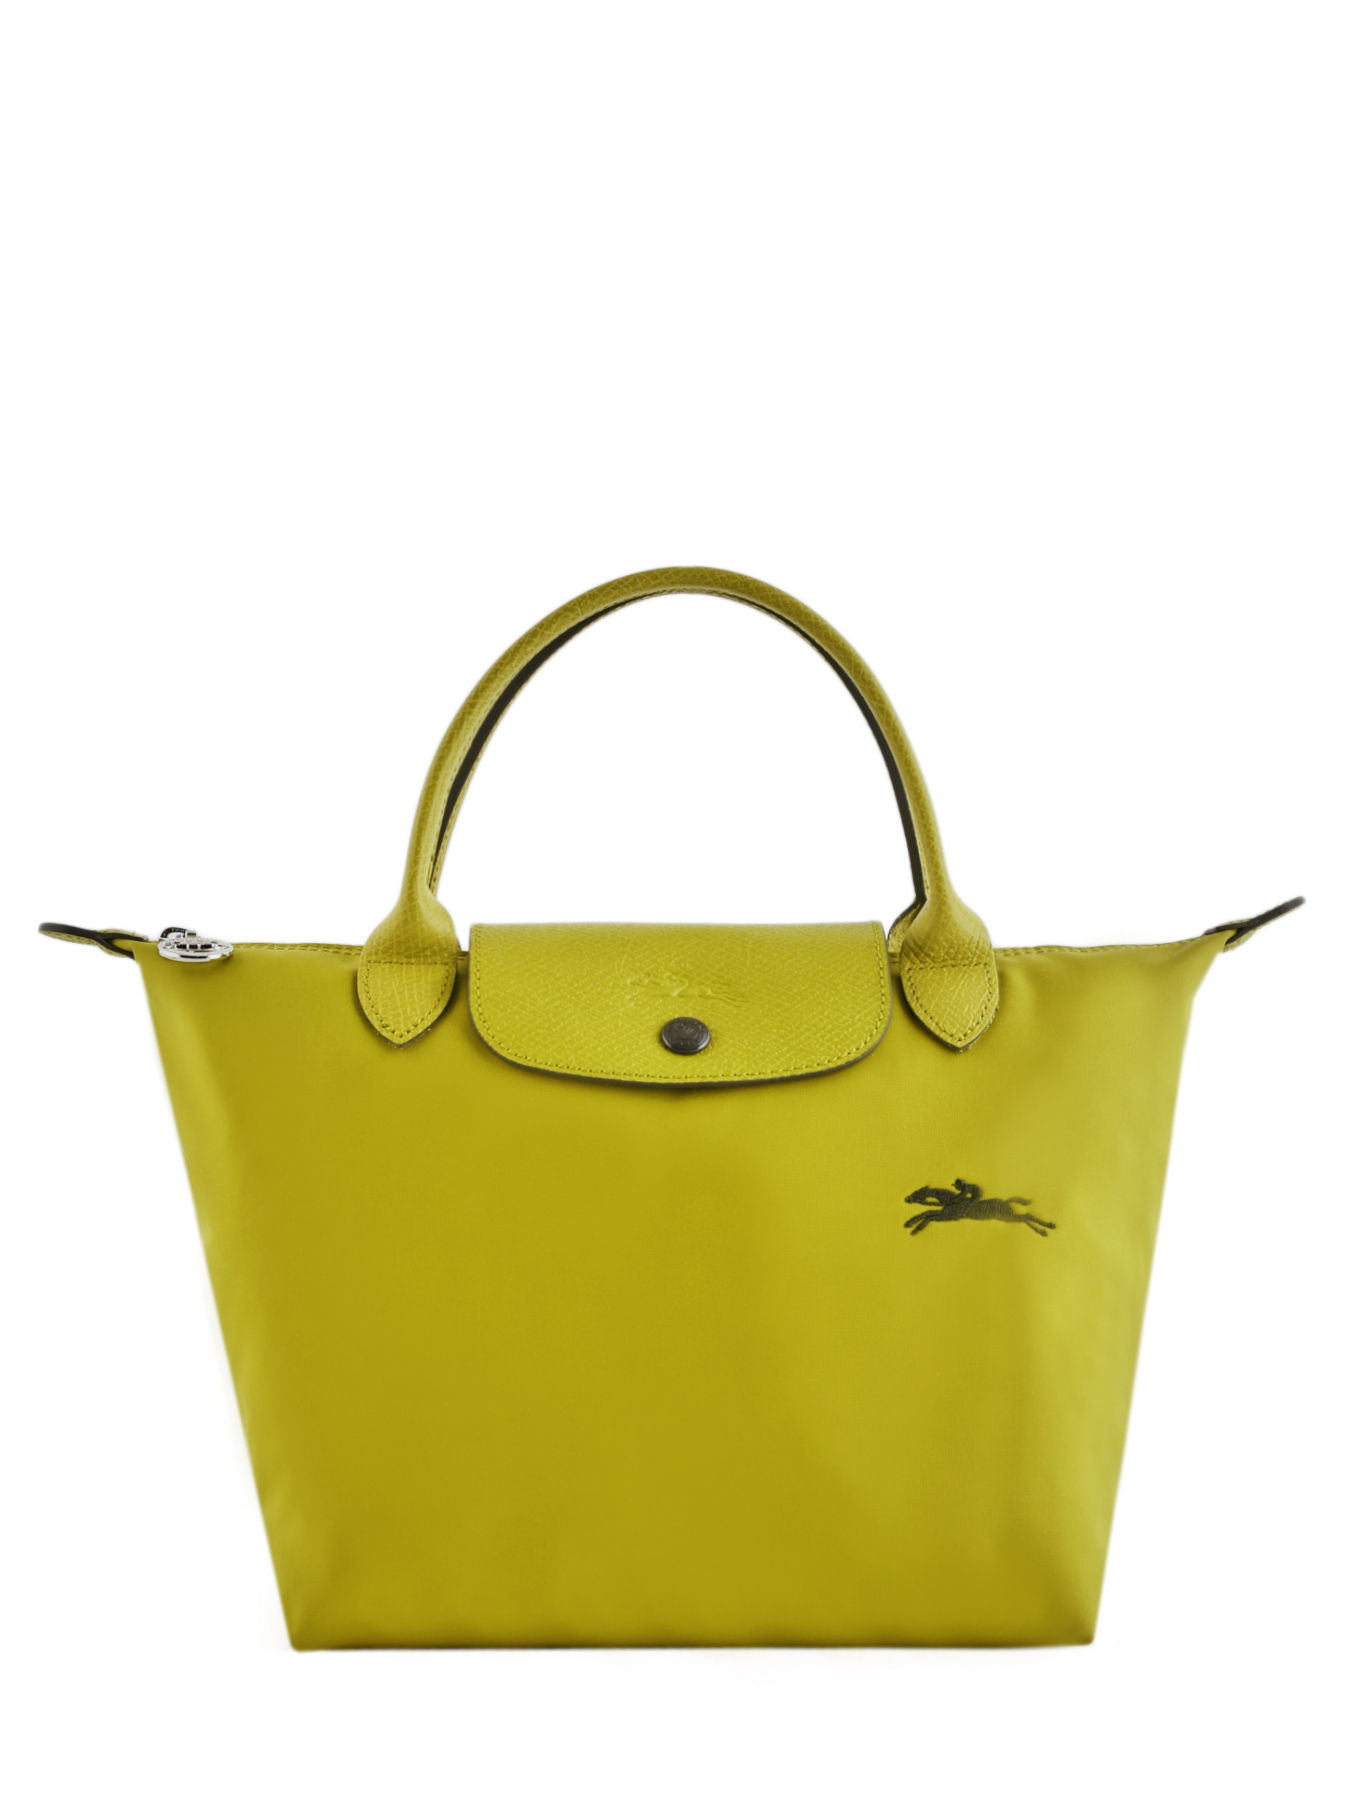 Handbag S Le Pliage Club Longchamp